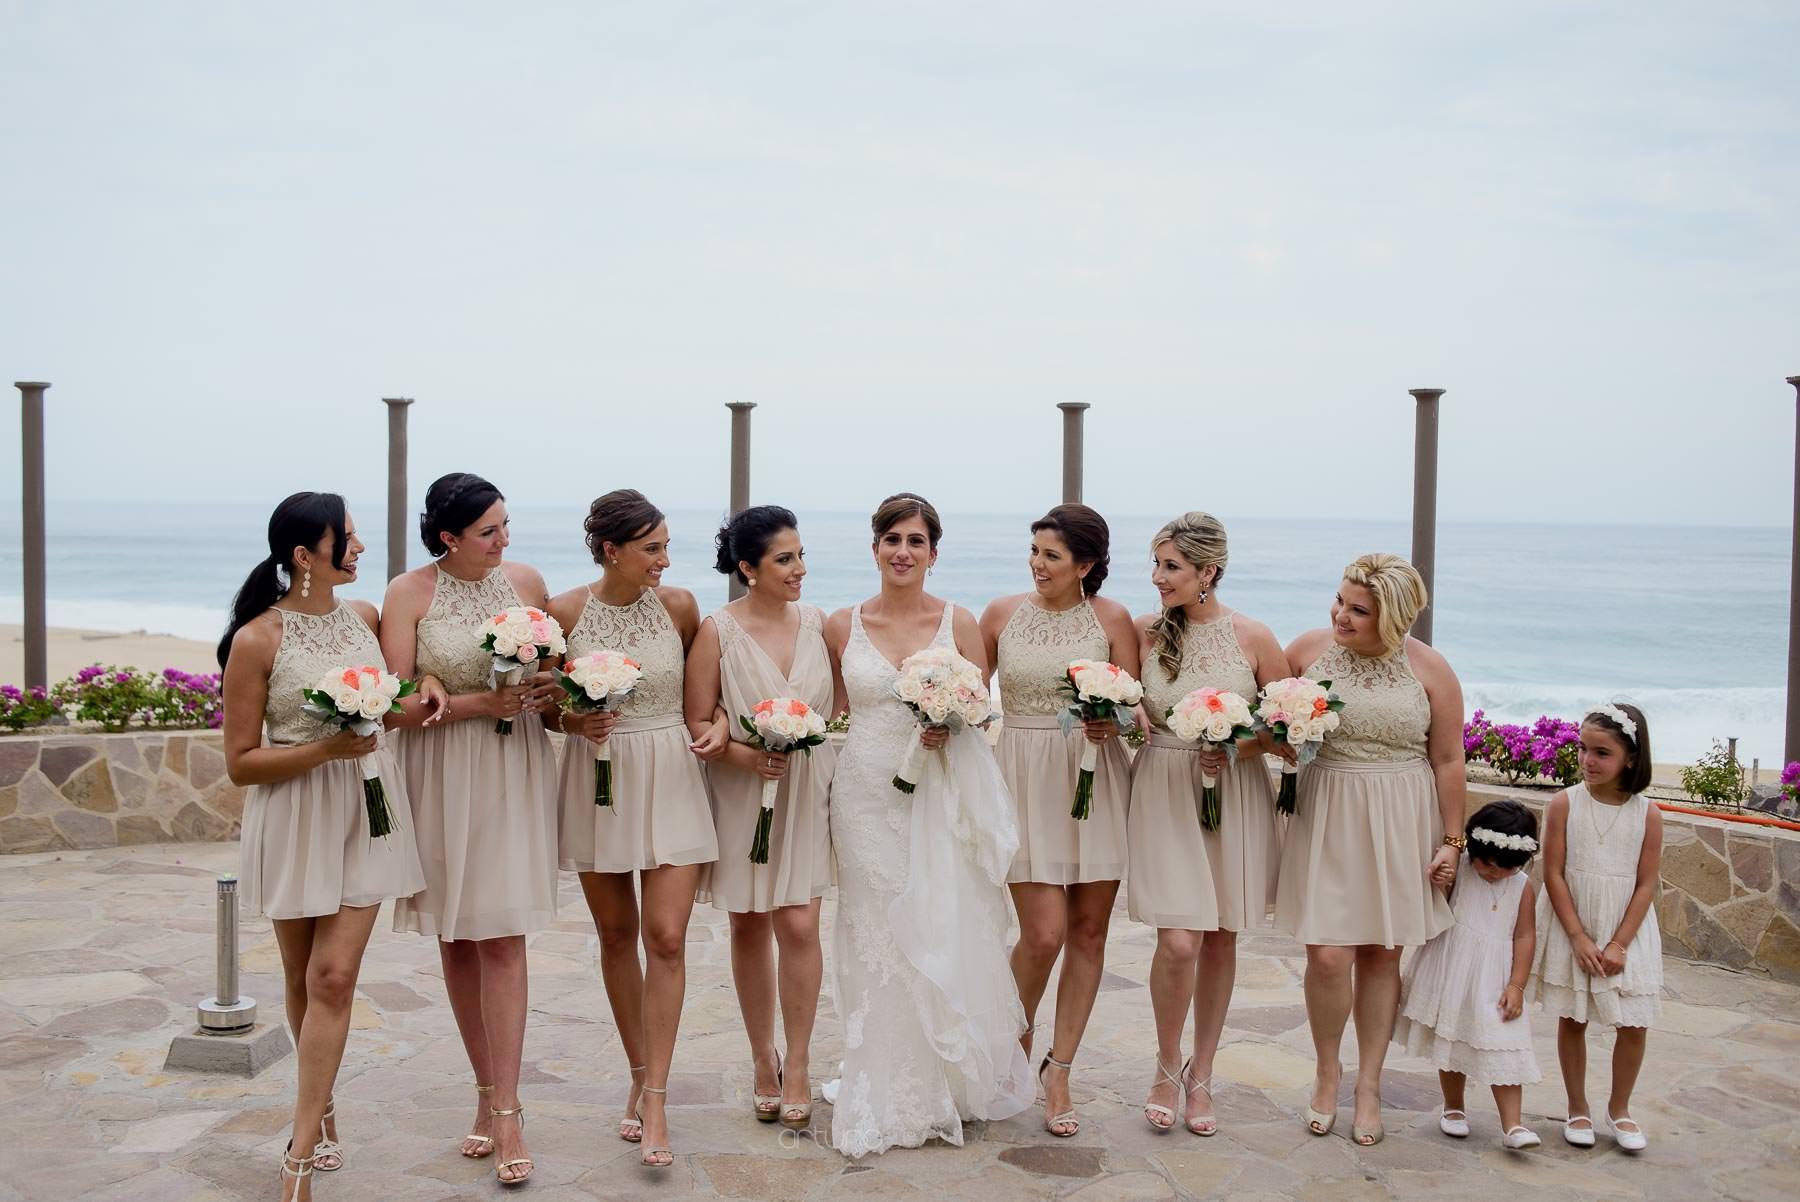 wedding-photos-pueblo-bonito-sunset-beach-4580